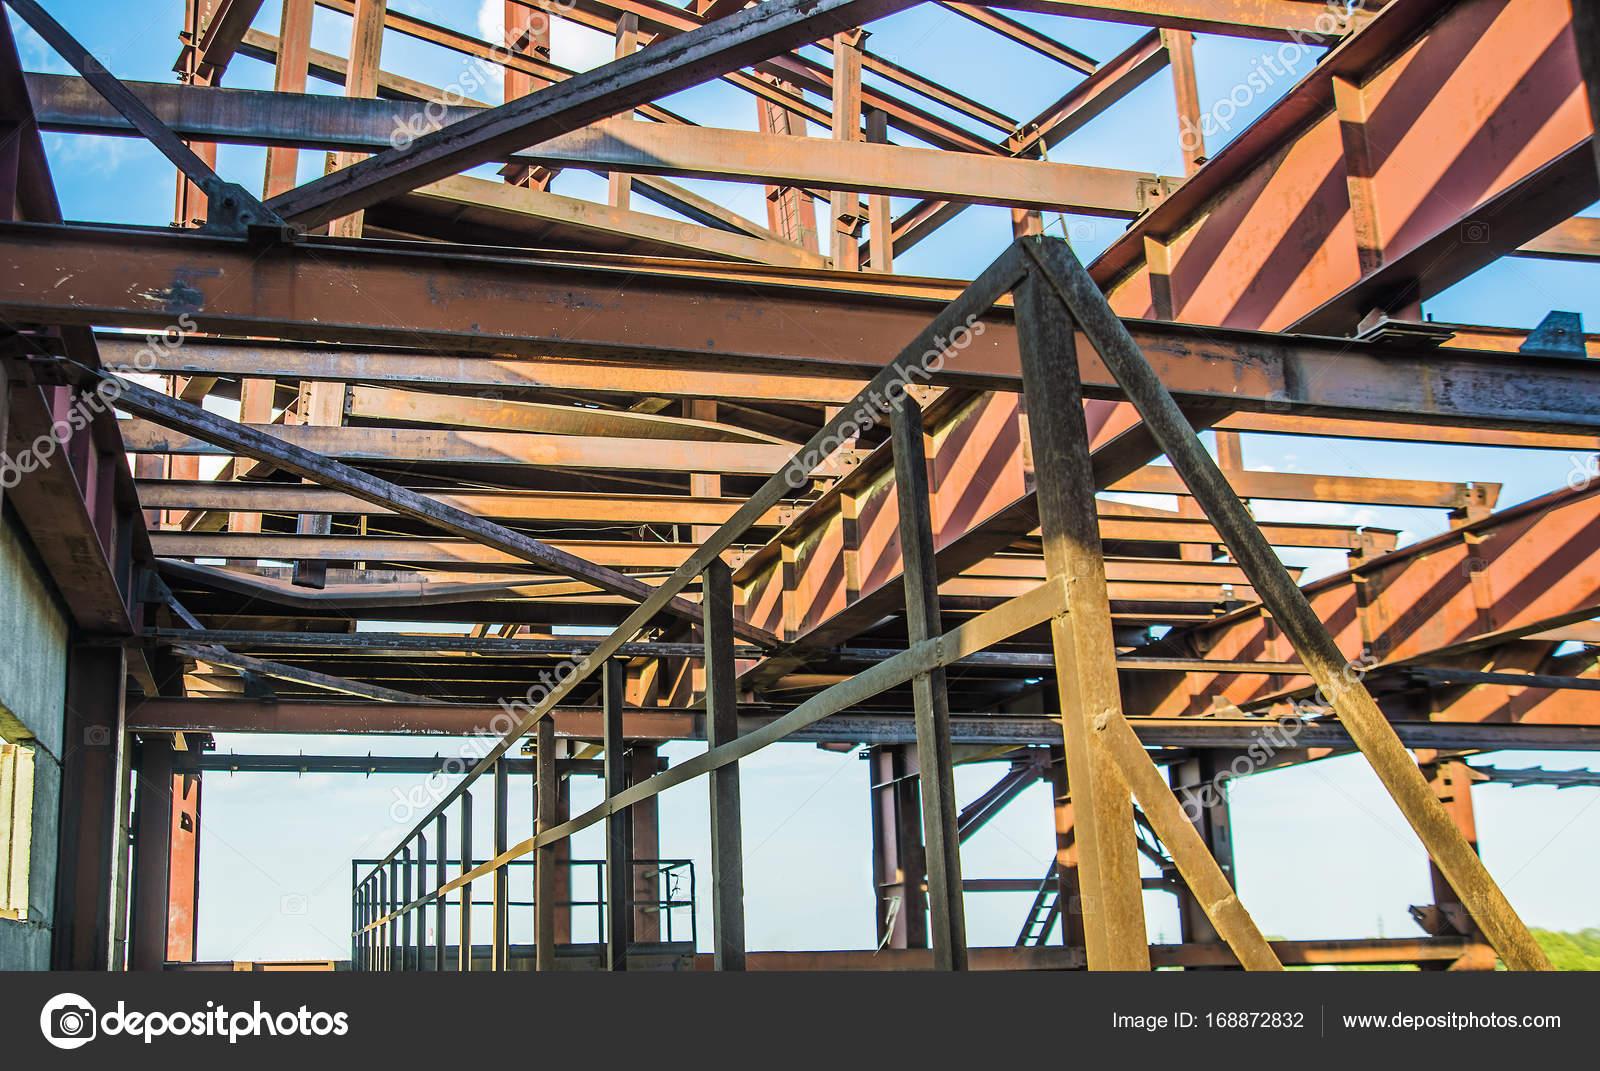 moderna estructura de metal Fotos de Stock borjomi88 168872832